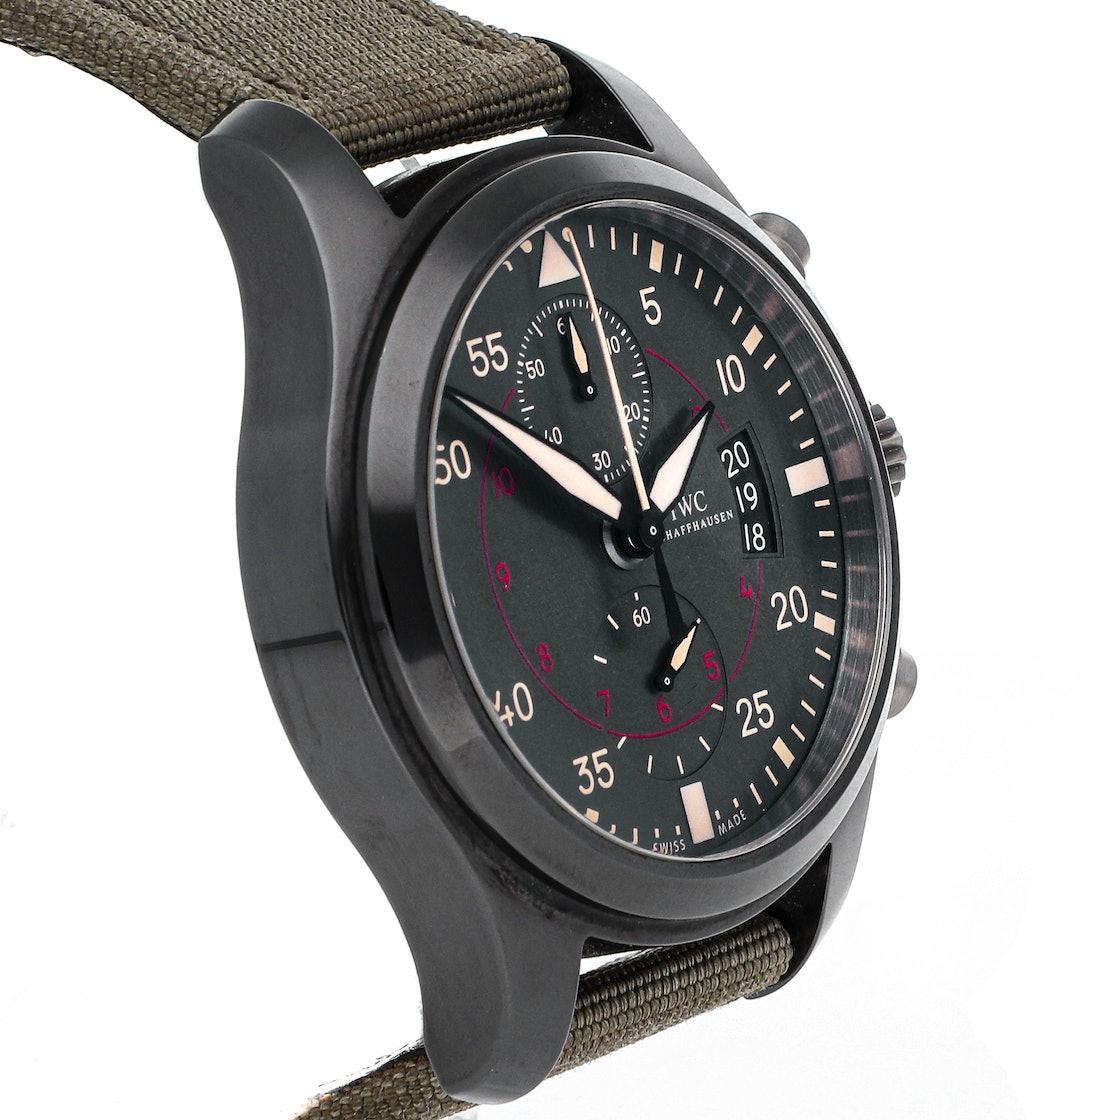 IWC Pilot's Top Gun Miramar Chronograph IW3880-02